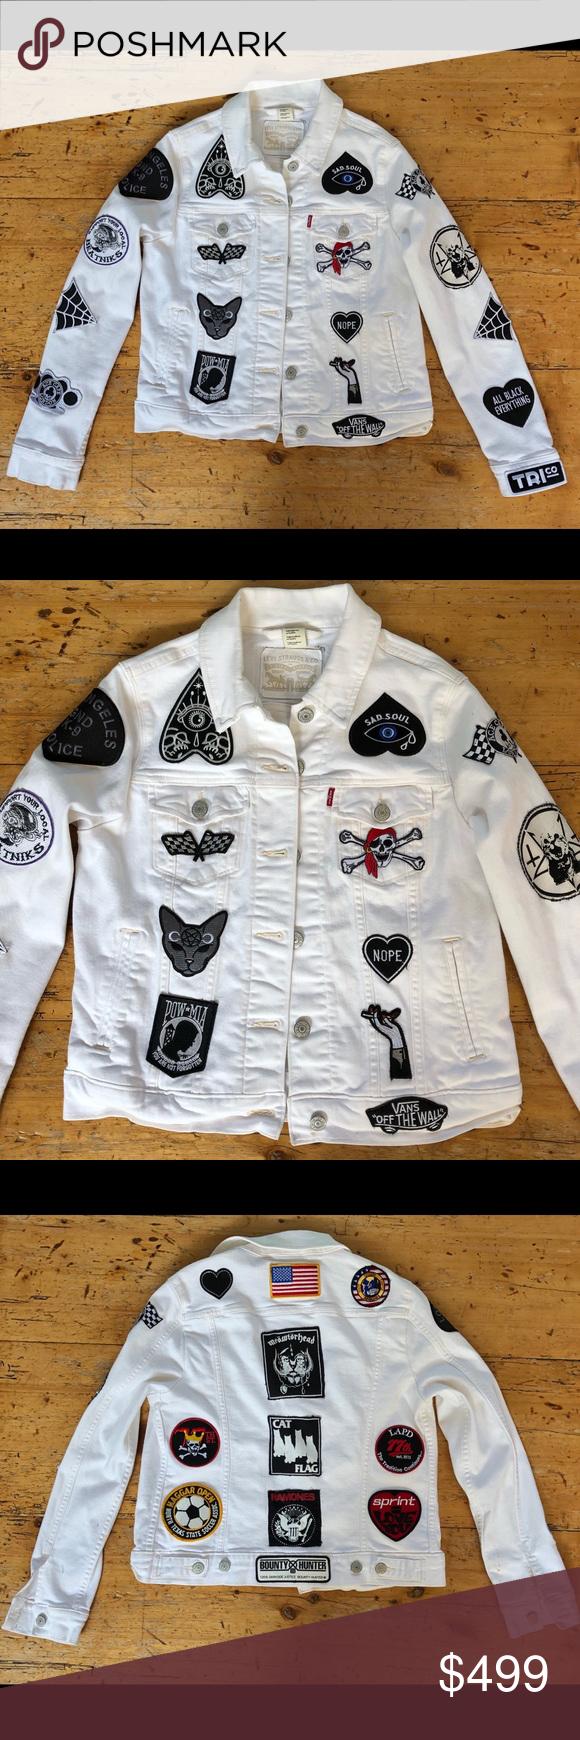 White Denim Levis Jean Jacket Covered In Patches White Denim Jacket Levis Jean Jacket White Denim [ 1740 x 580 Pixel ]